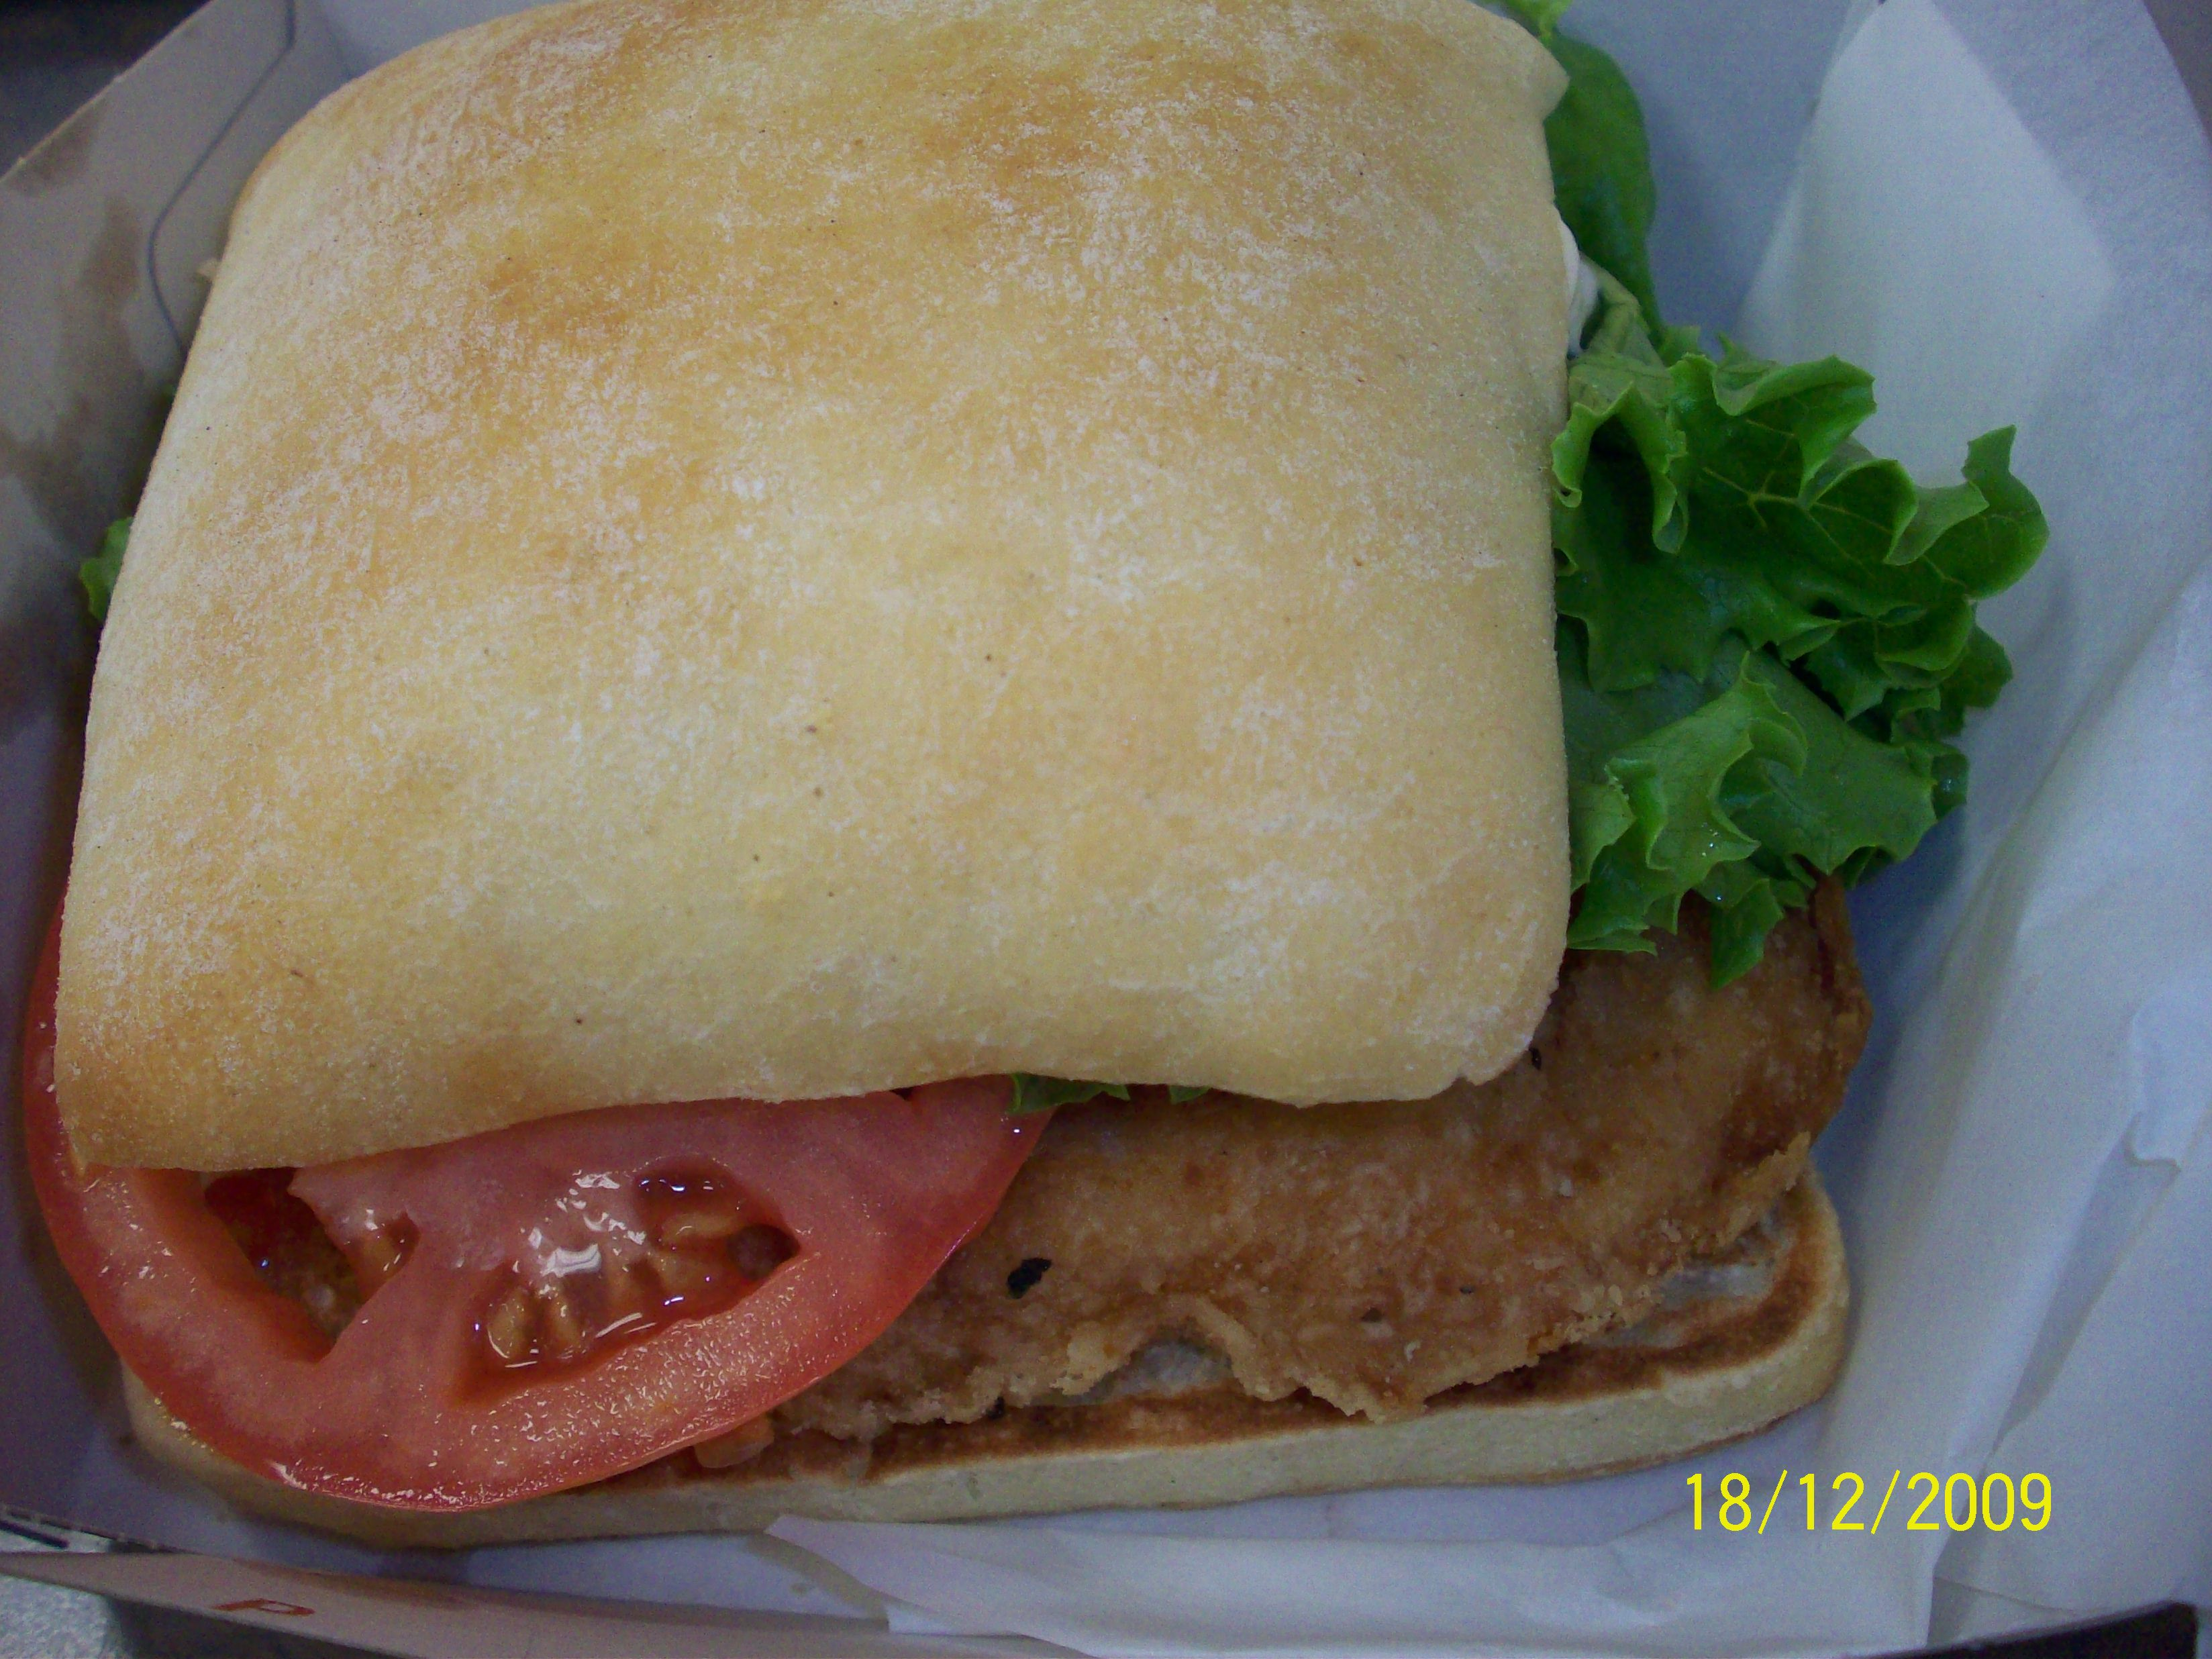 http://foodloader.net/cutie_2009-12-18_Crispy_McChicken_Burger.jpg